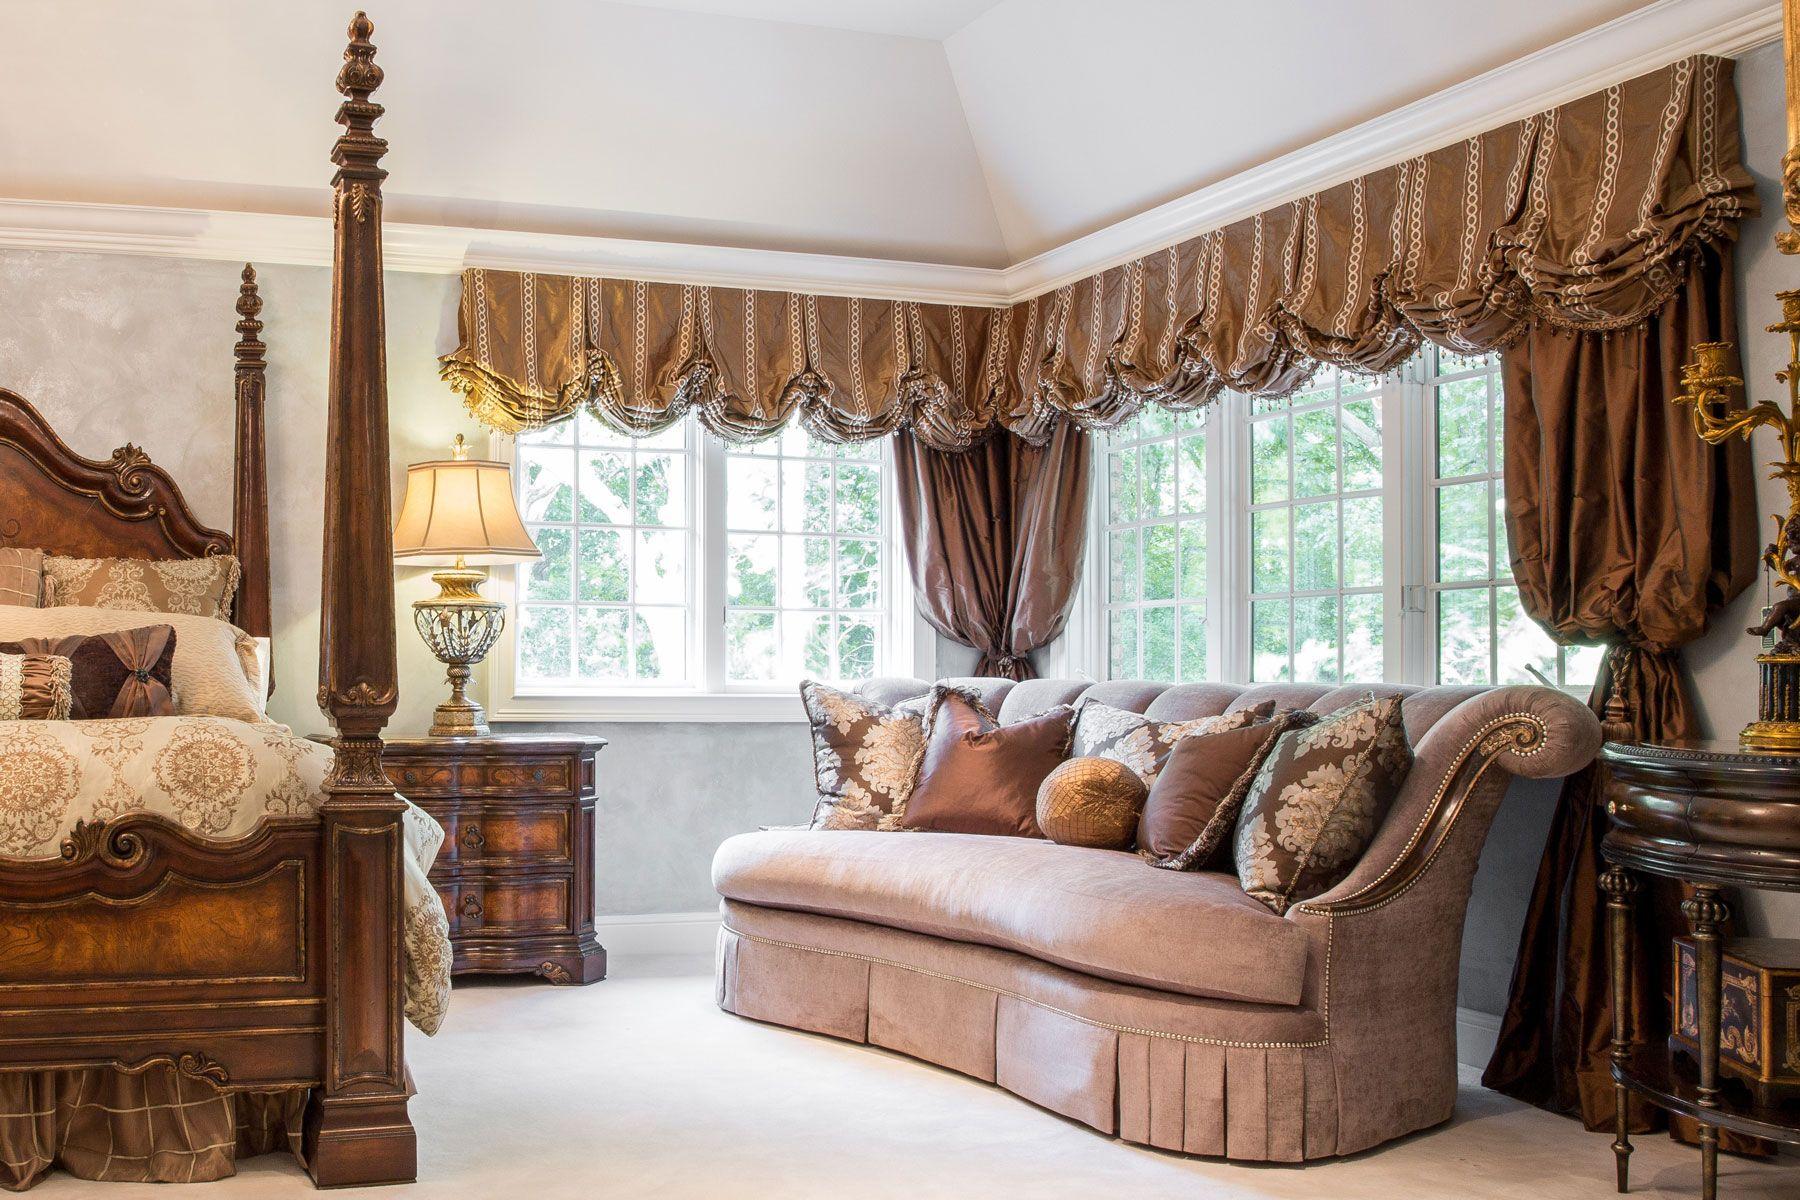 Window decor for bedroom  custom window treatments in master bedroom  window treatments